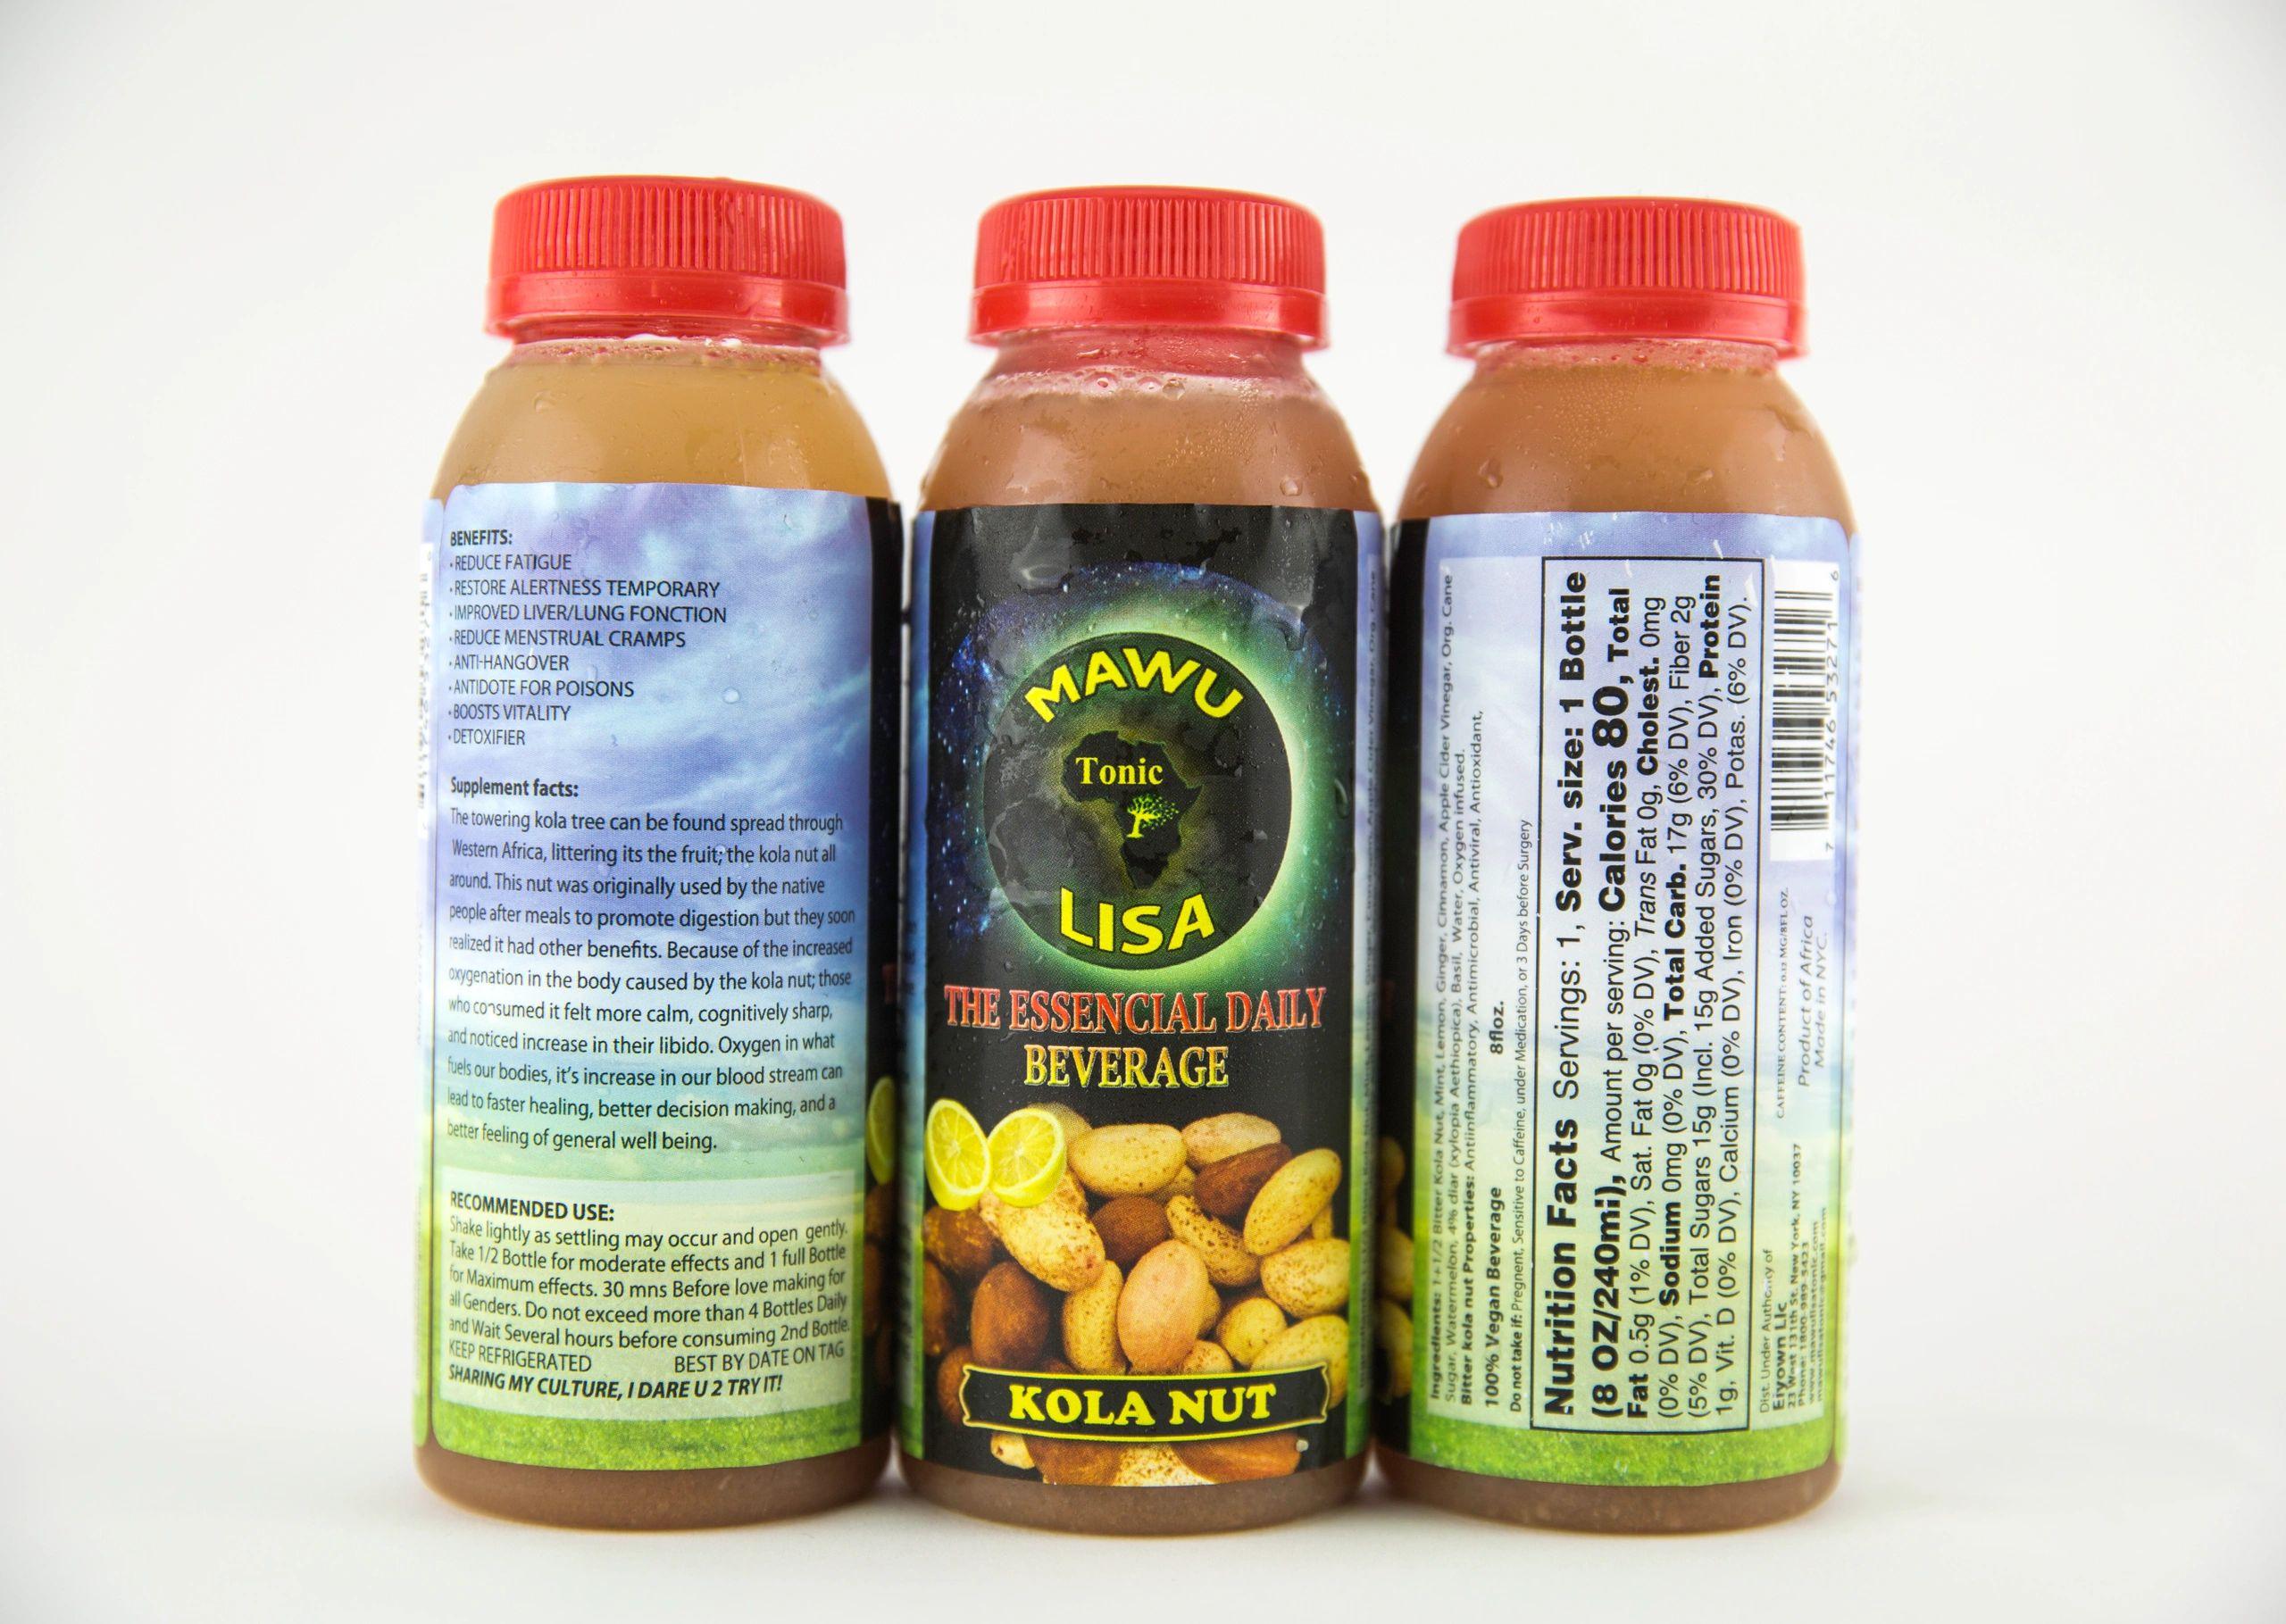 Elyown - Bitter Kola Nut, Kola Nut, Agriculture   Mawu lisa Tonic